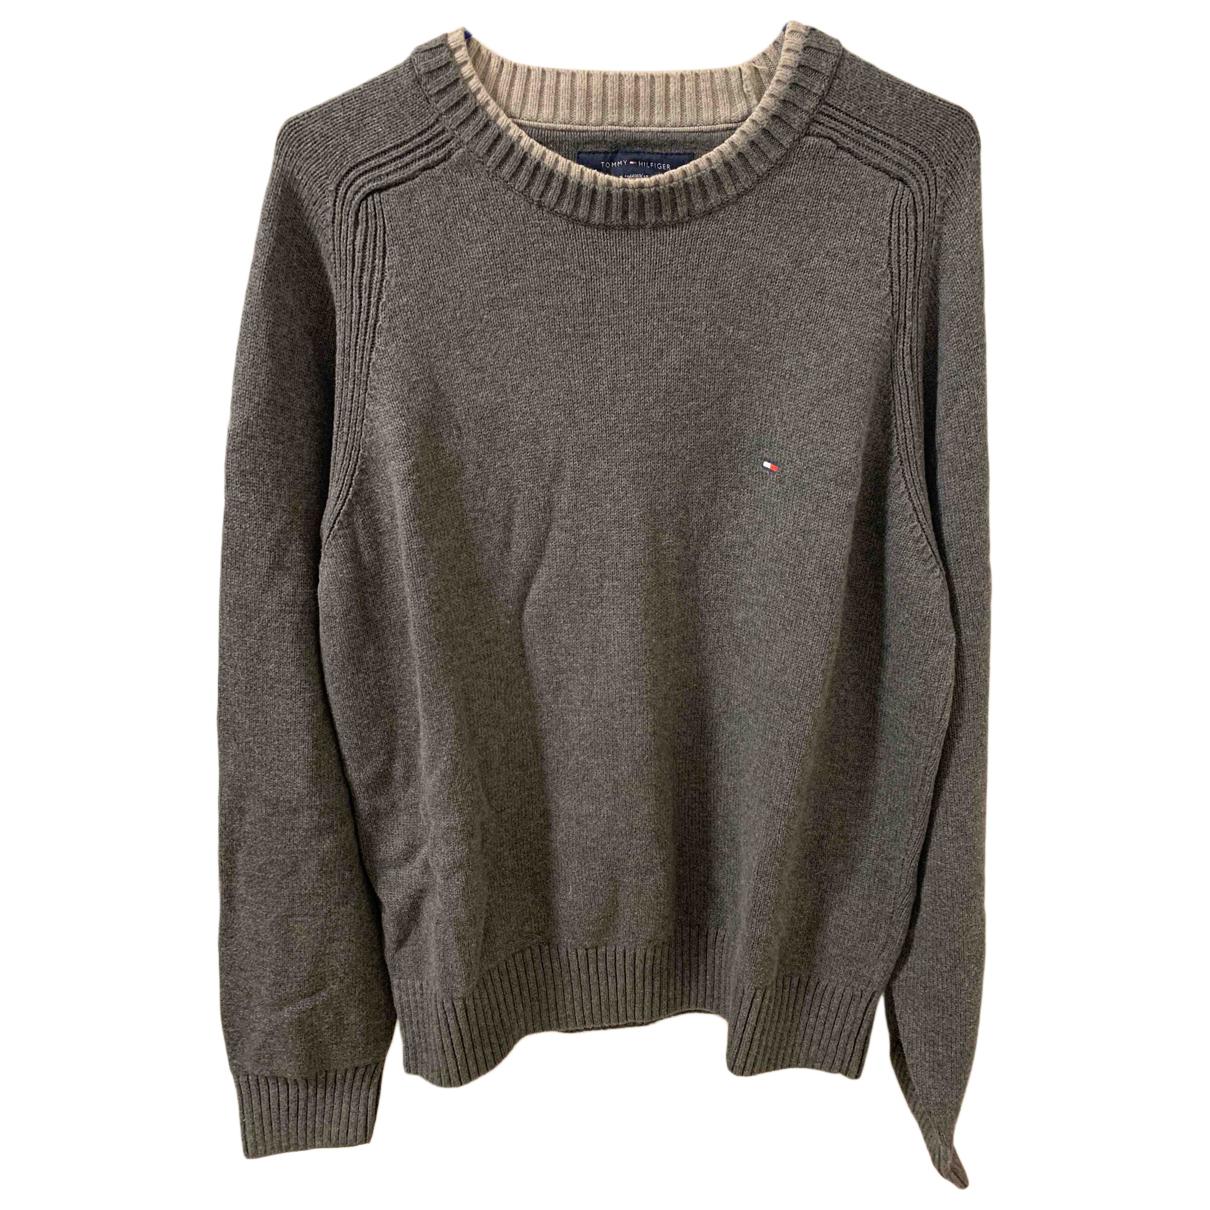 Tommy Hilfiger N Grey Cotton Knitwear & Sweatshirts for Men M International